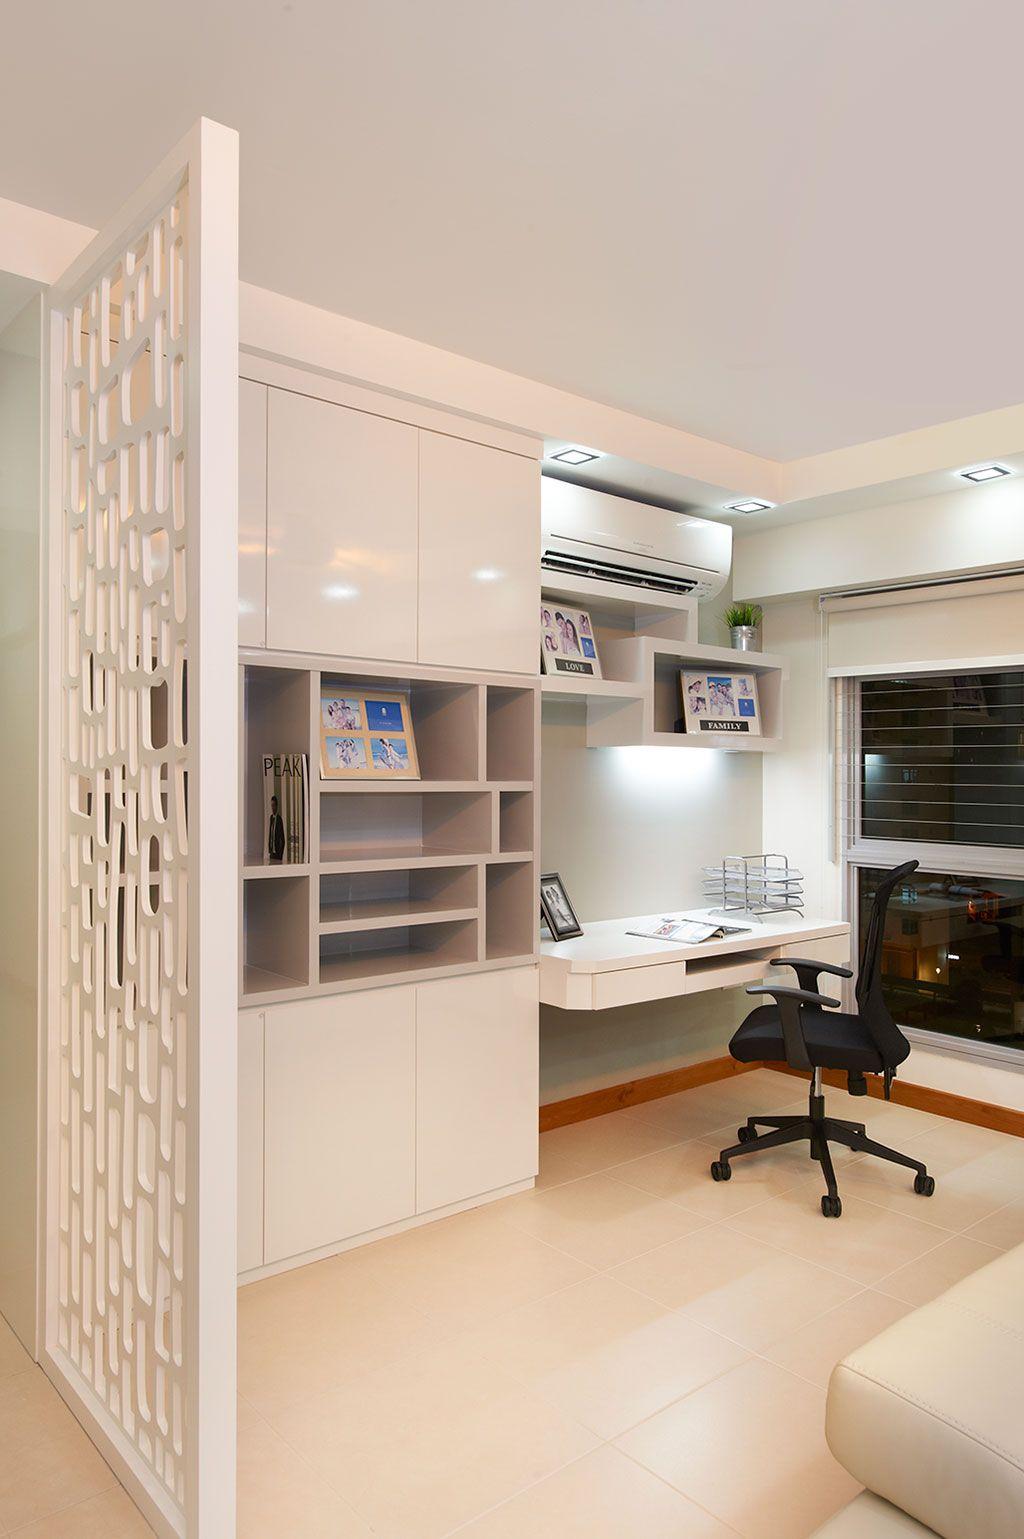 hdb bedroom renovation ideas  corepadinfo  Pinterest